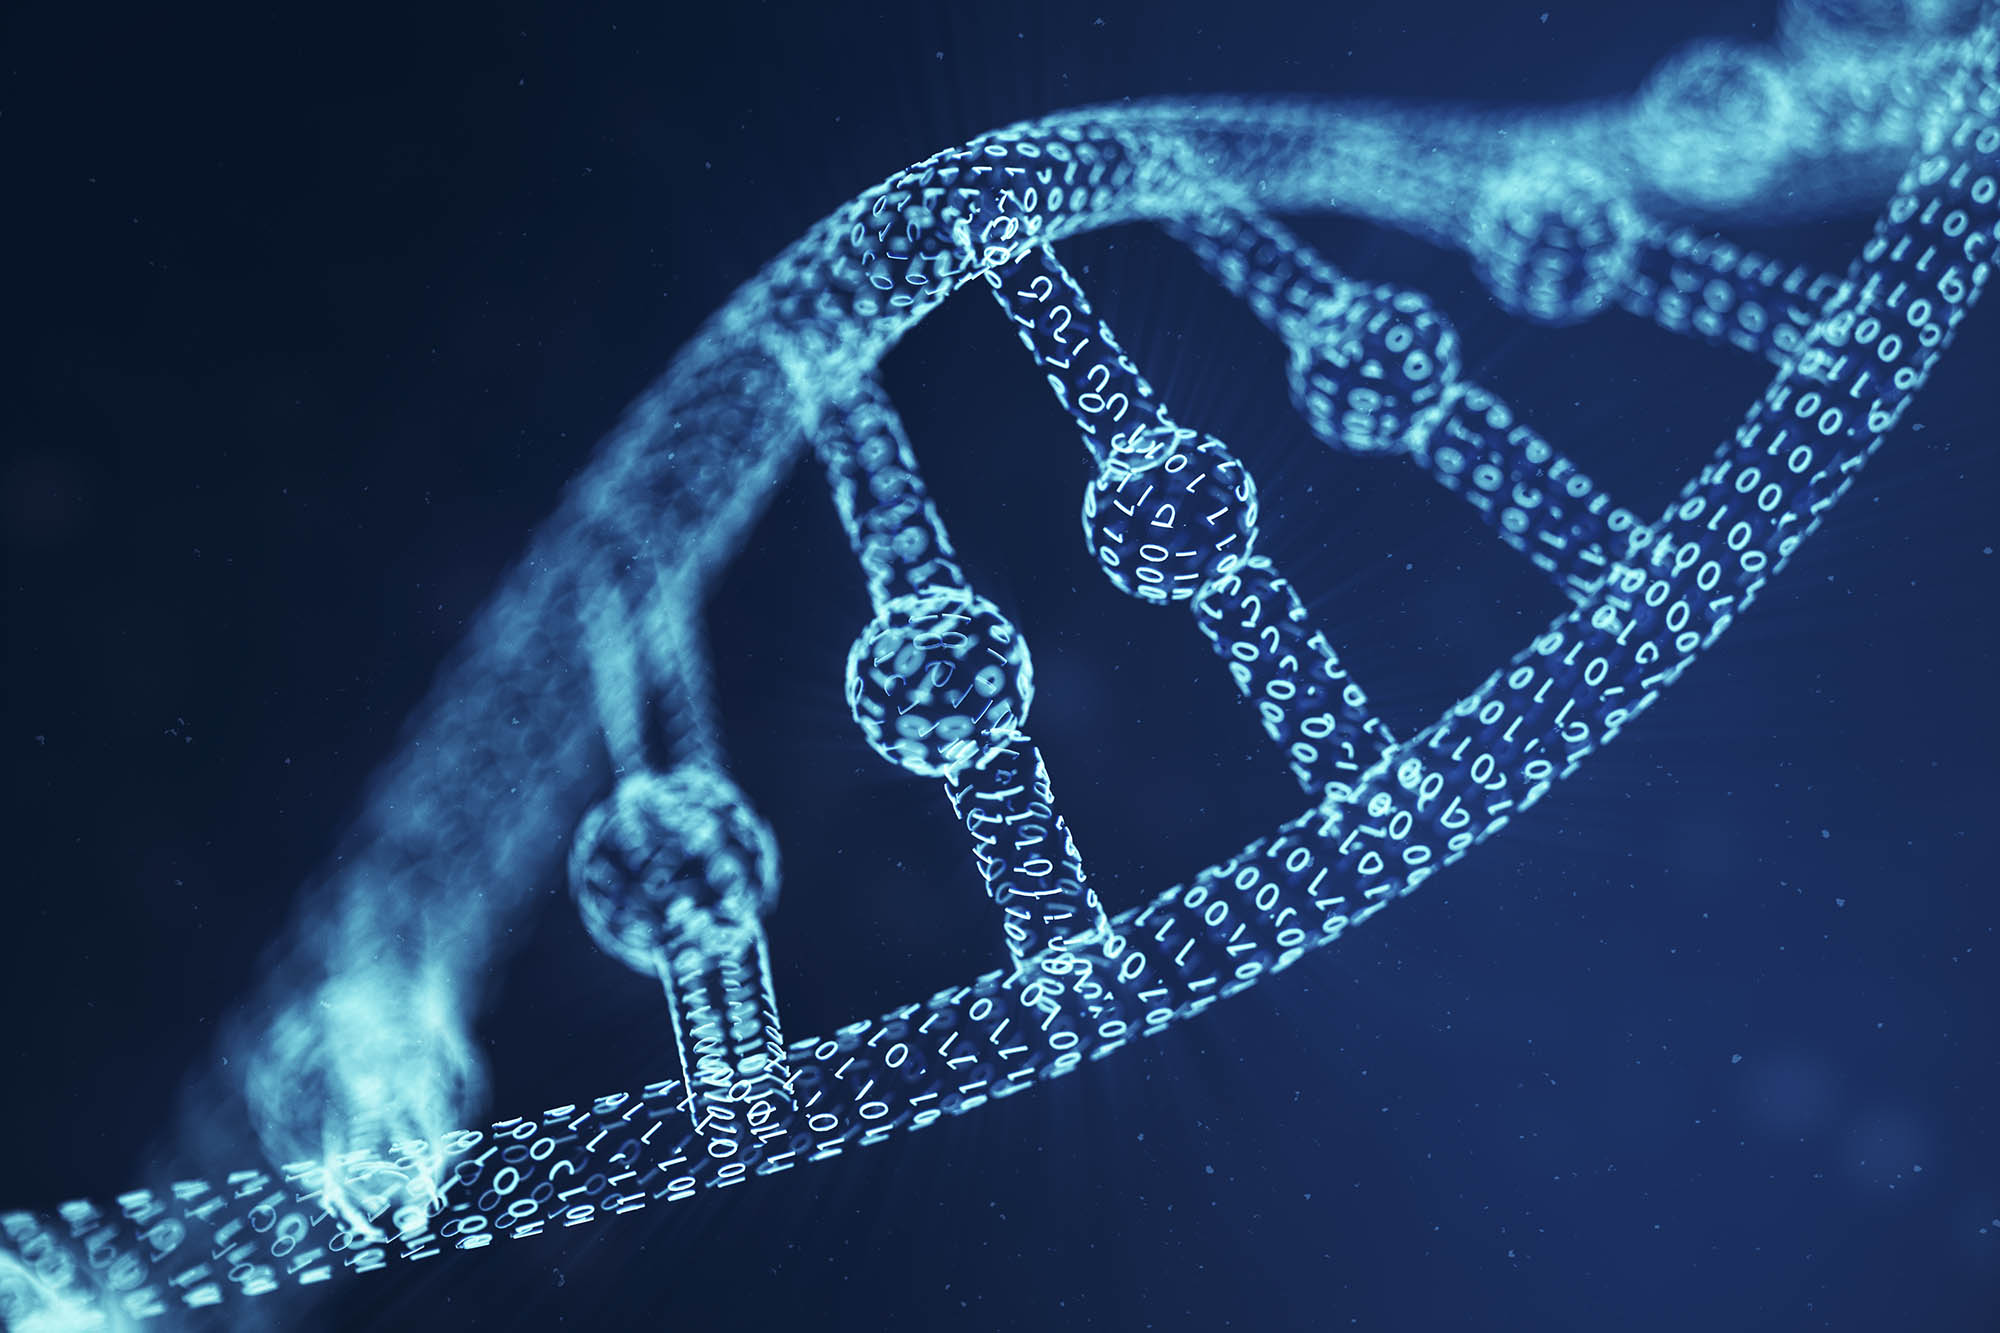 UVA Pioneers Study of Genetic Diseases With Mind-Bending Quantum Computing